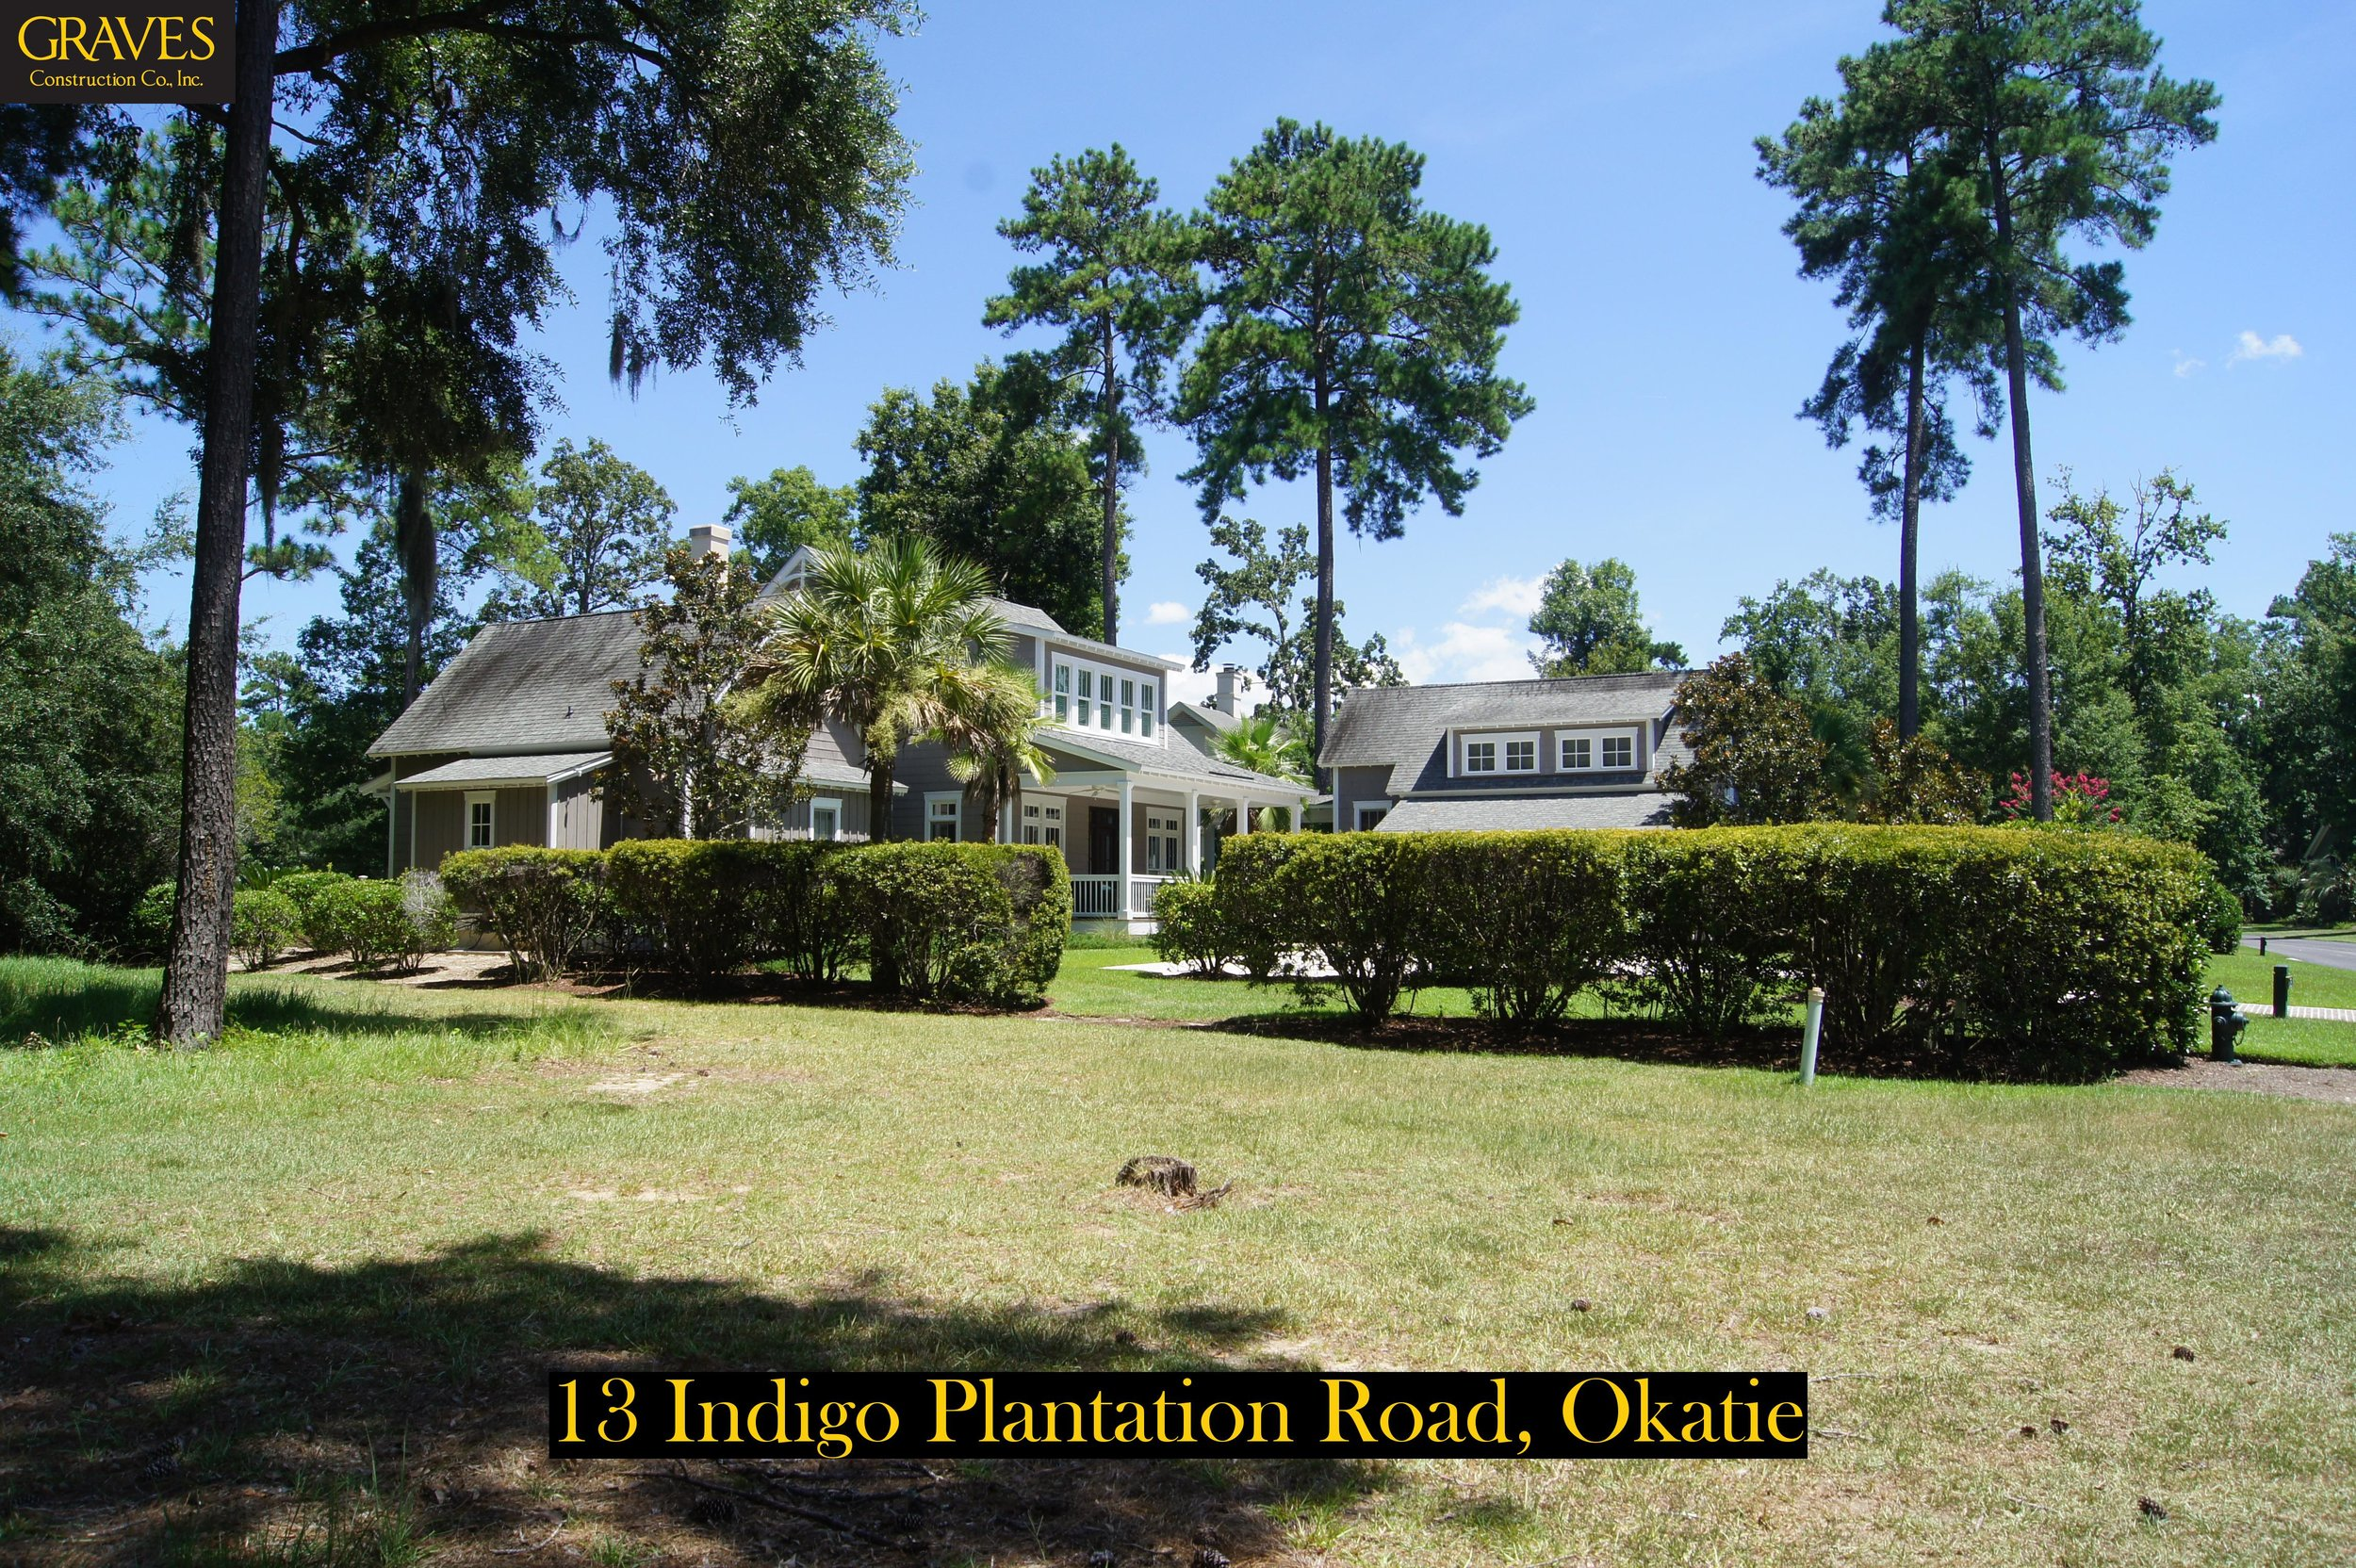 13 Indigo Plantation Rd - 6